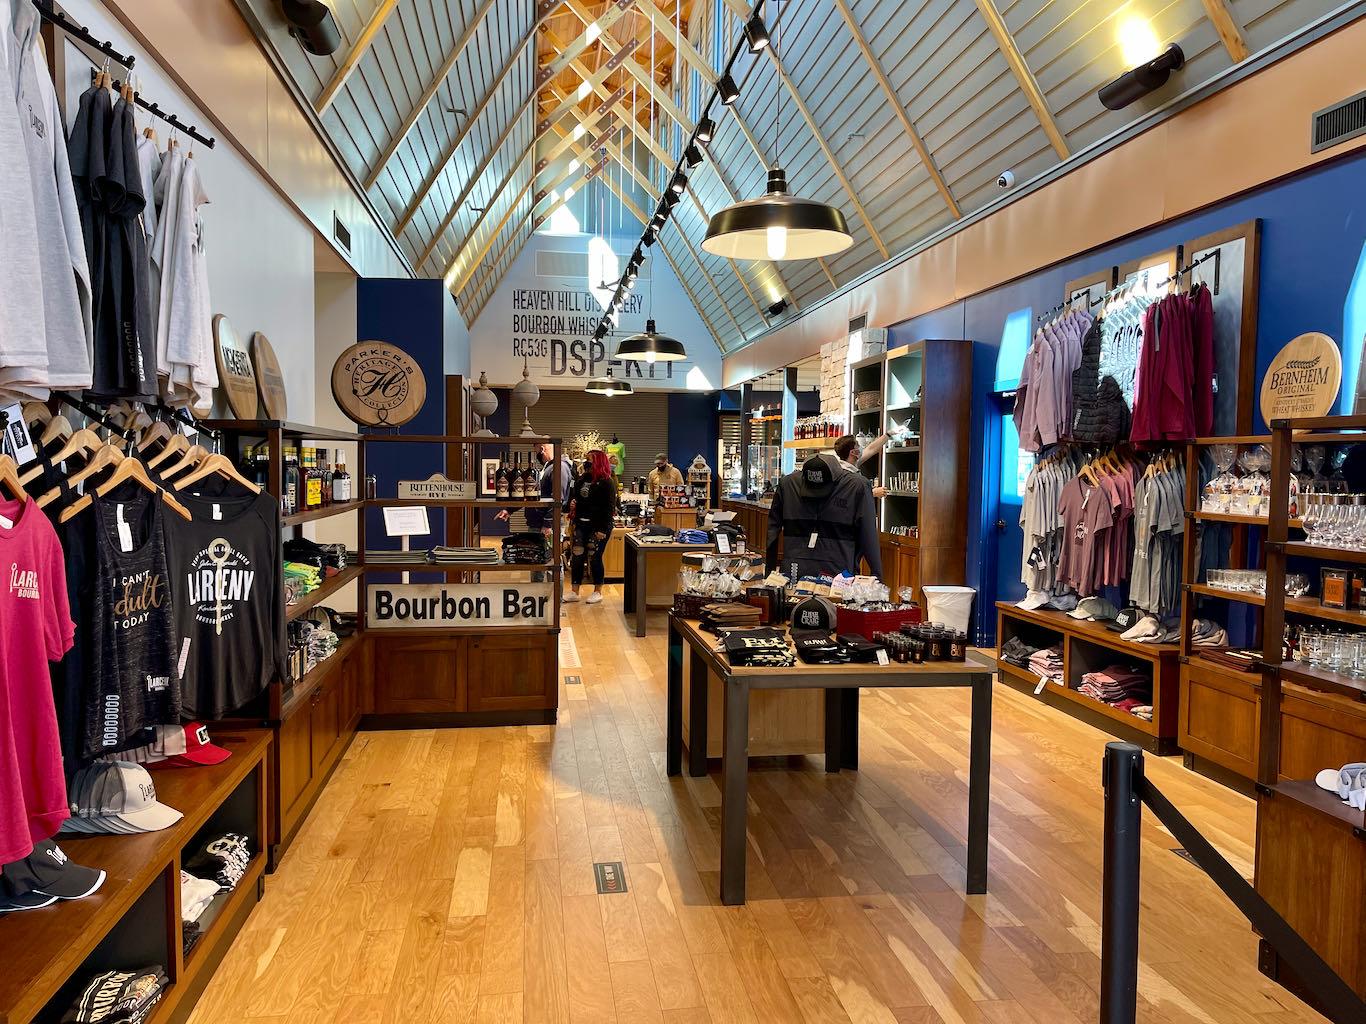 Gift Shop - Heaven Hill Distillery Bourbon Heritage Center